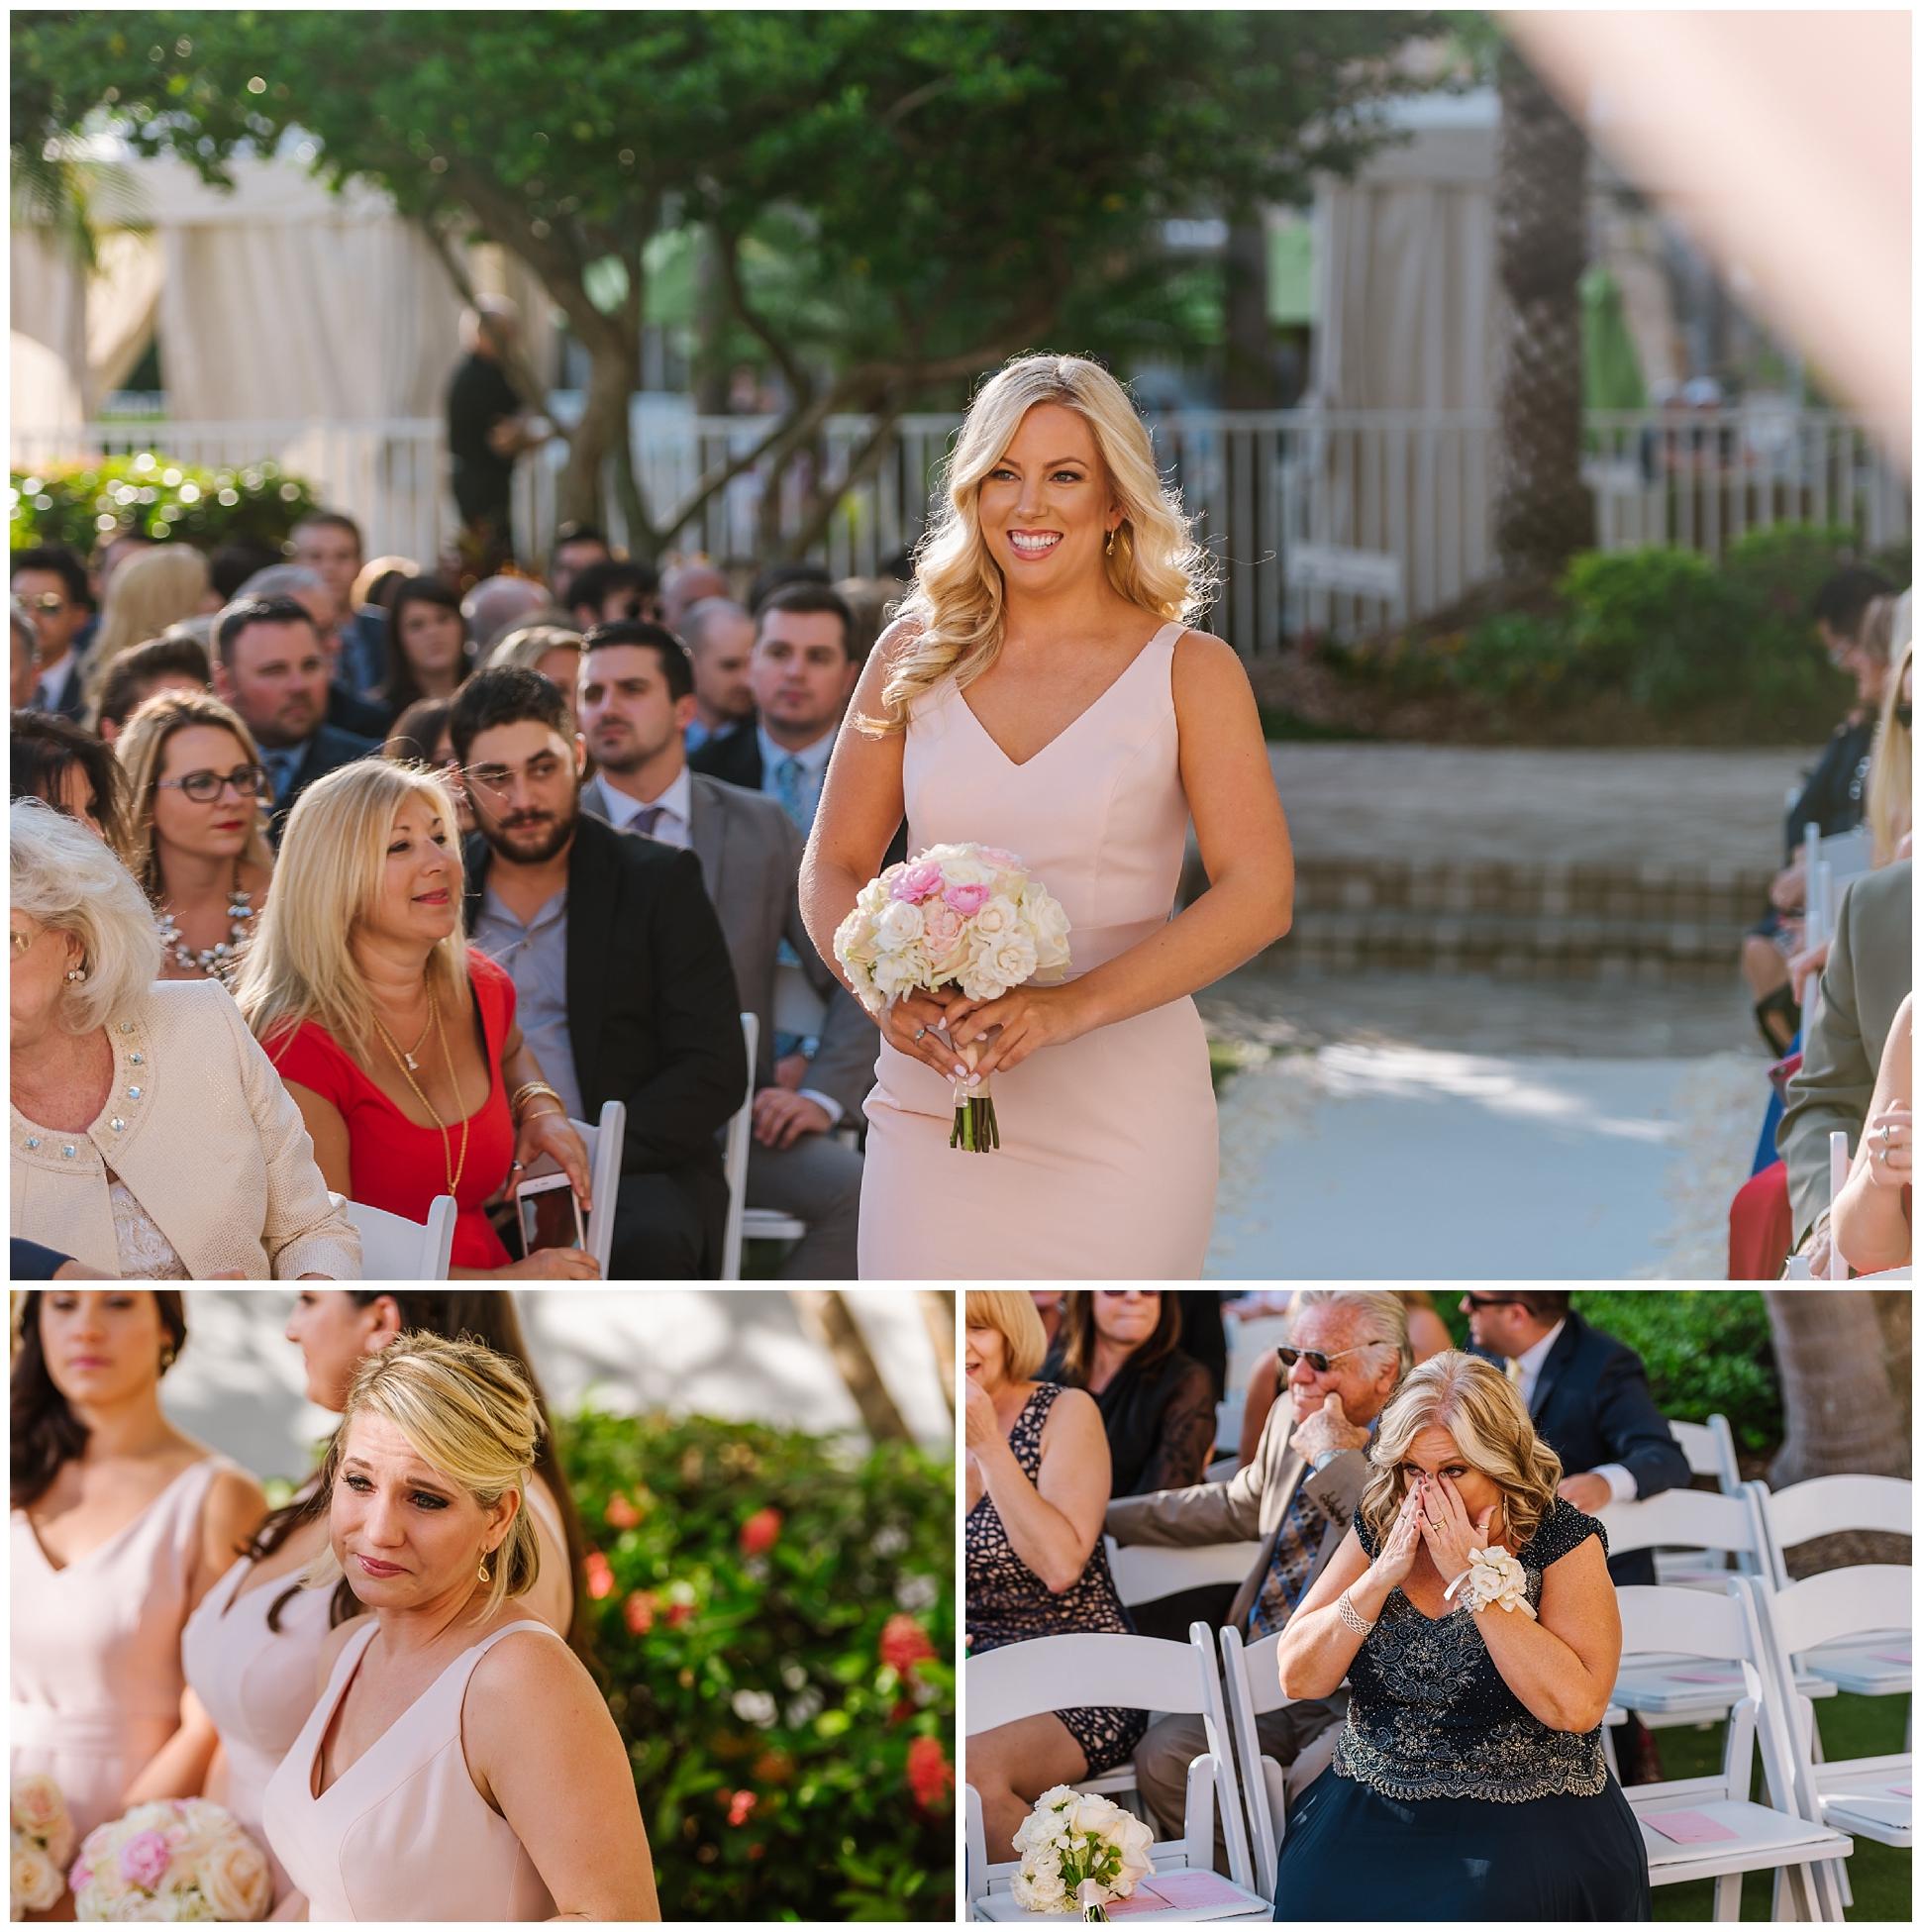 Sarasota-wedding-photographer-hyatt-regency-blush_0033.jpg